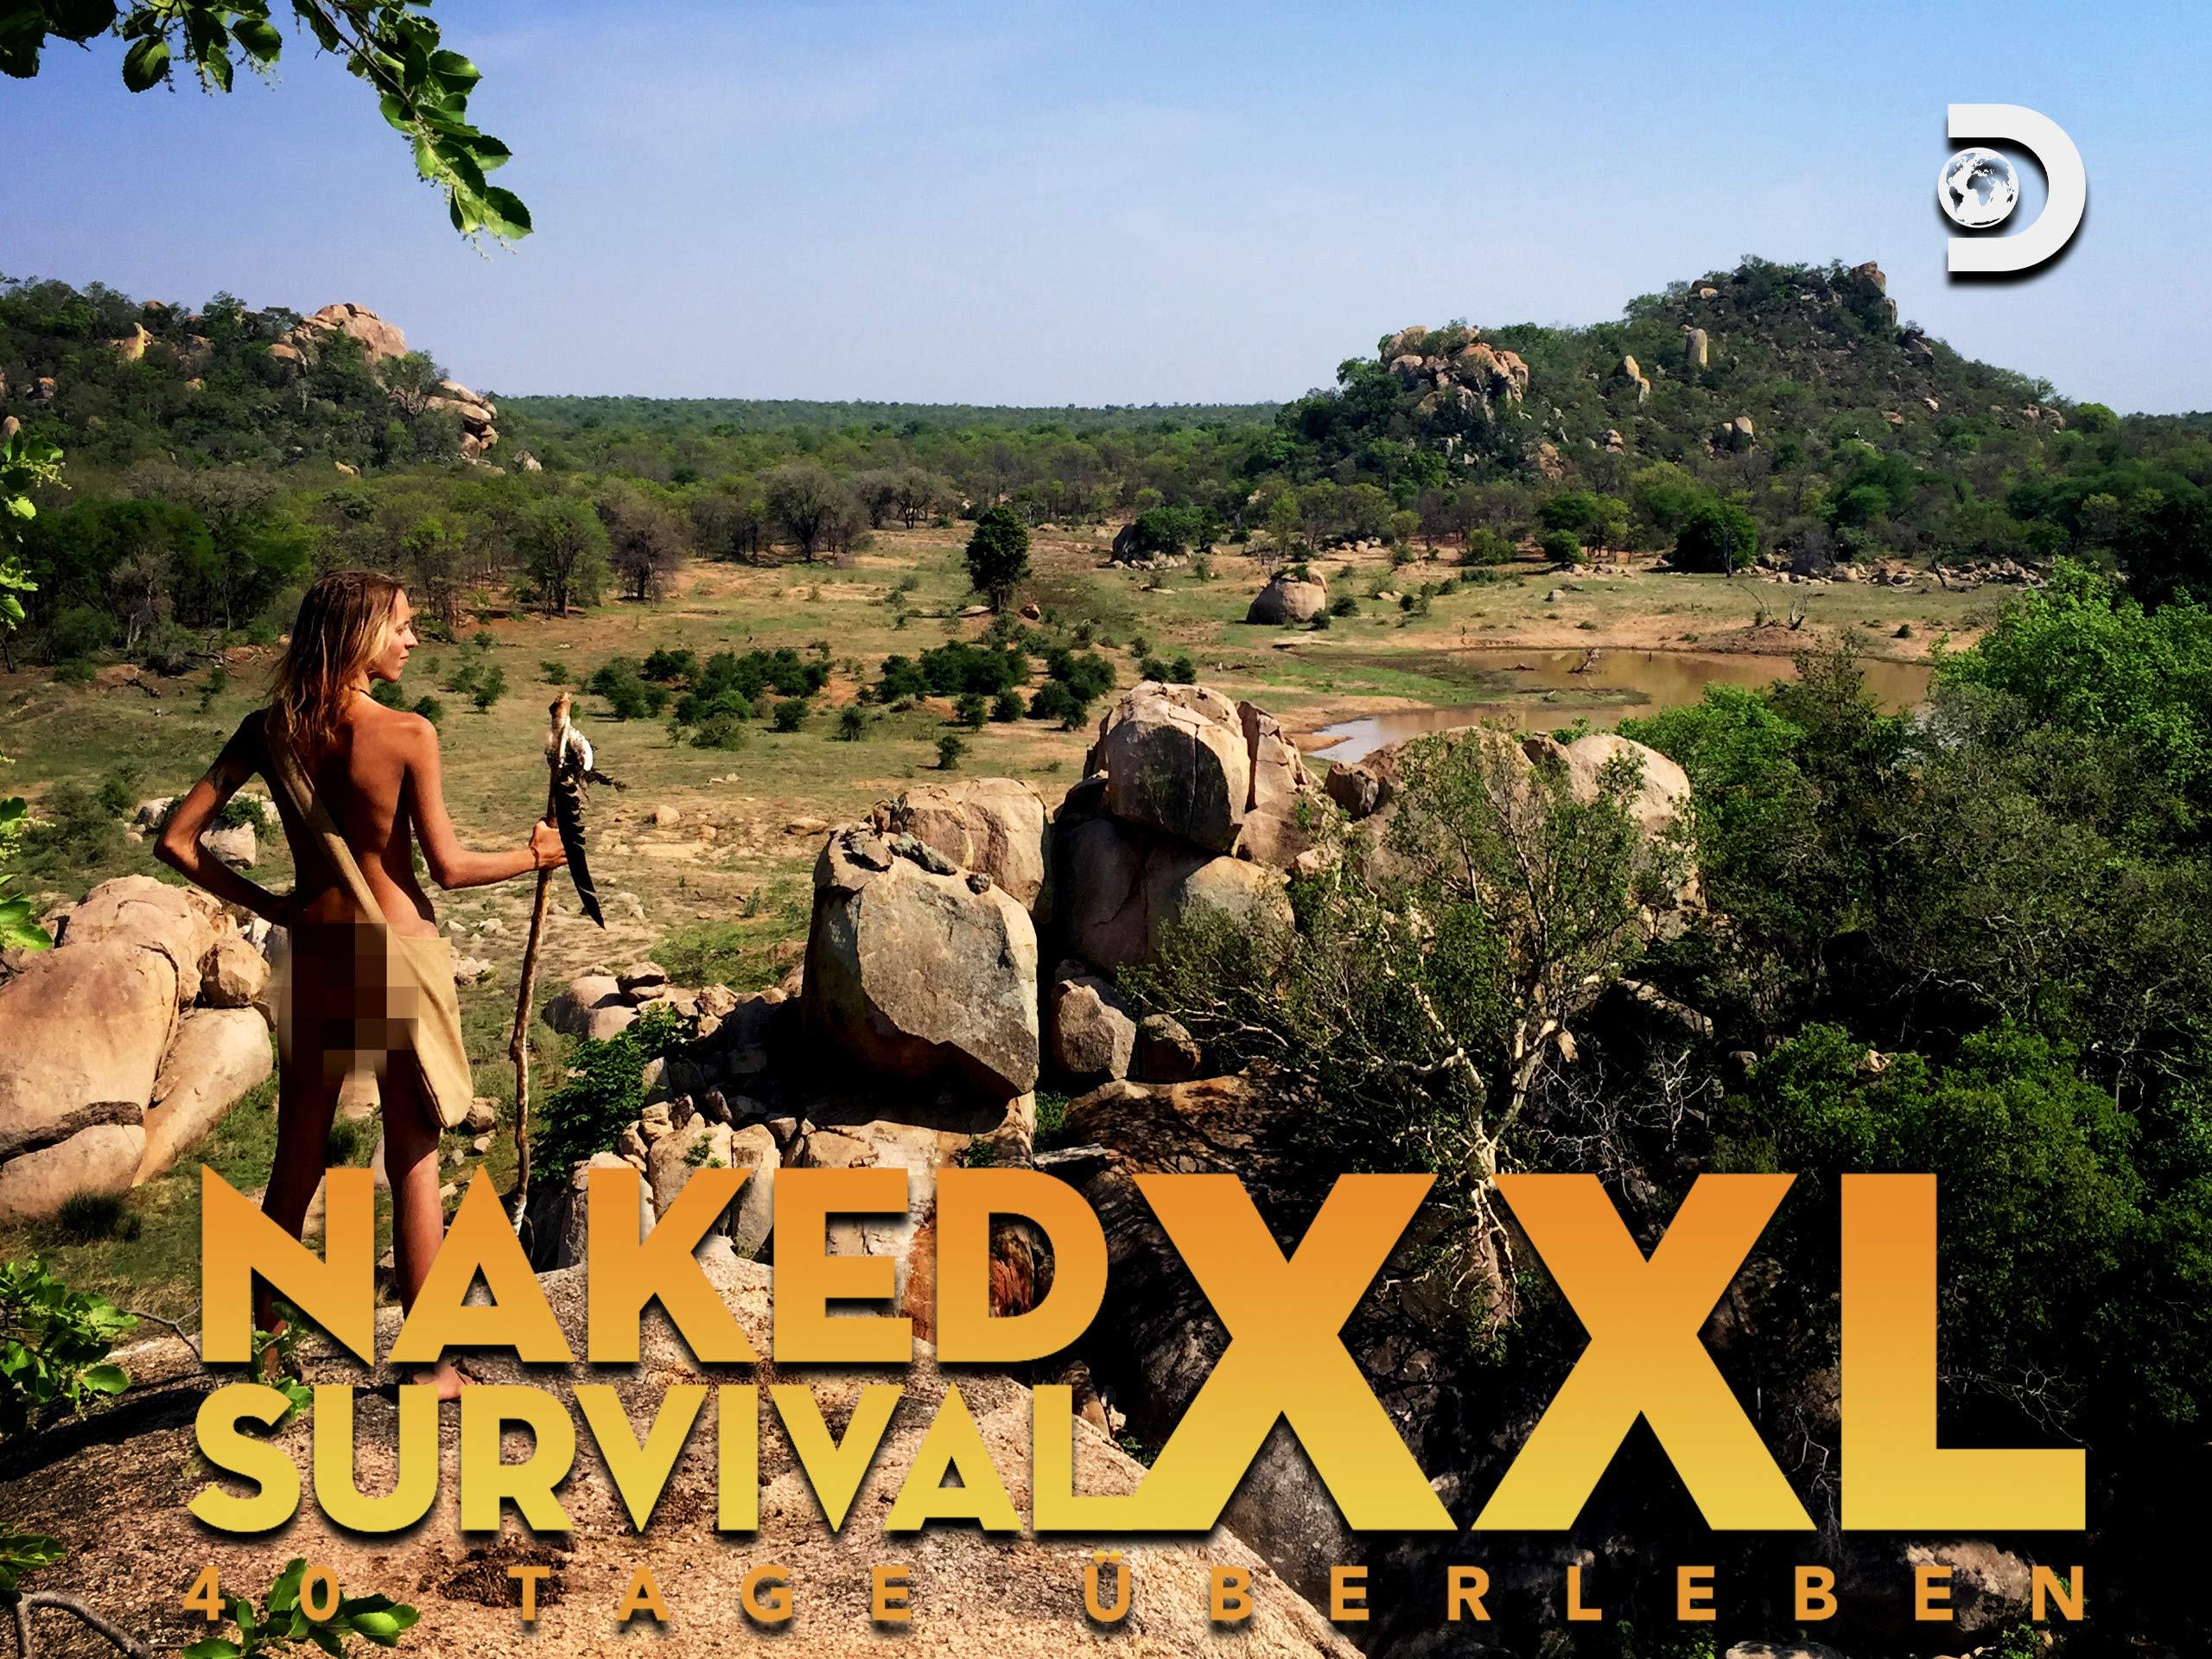 Naked Survival XXL - 40 Tage Überleben | Apple TV